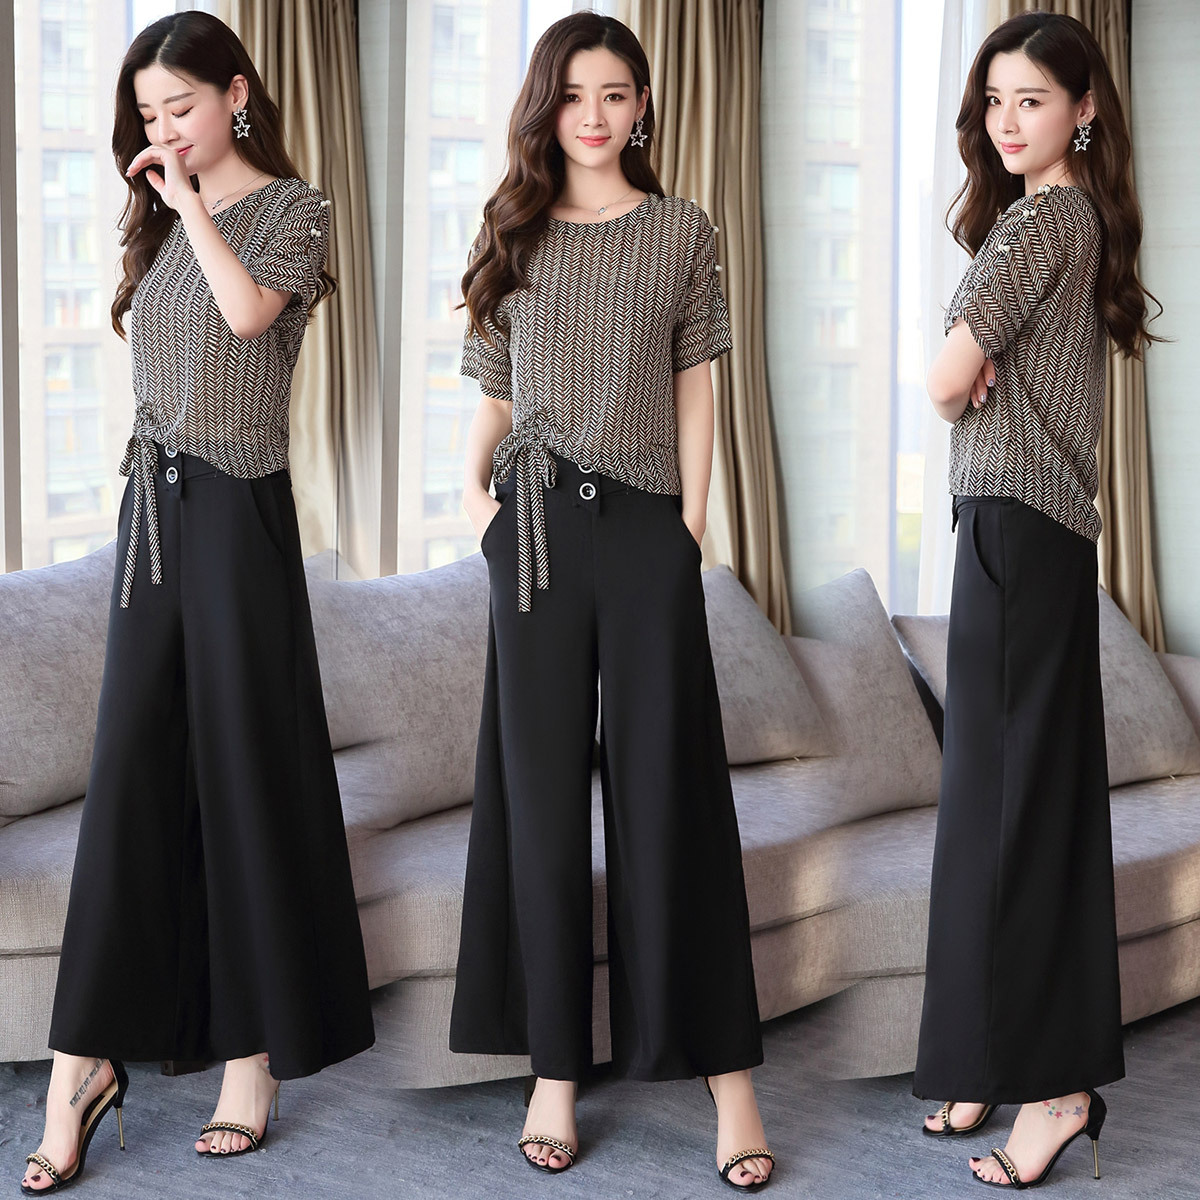 2018 Summer Set/Suit Skirt Street Fashion Elegant Slim Fit Slimming Simple Cute Versatile